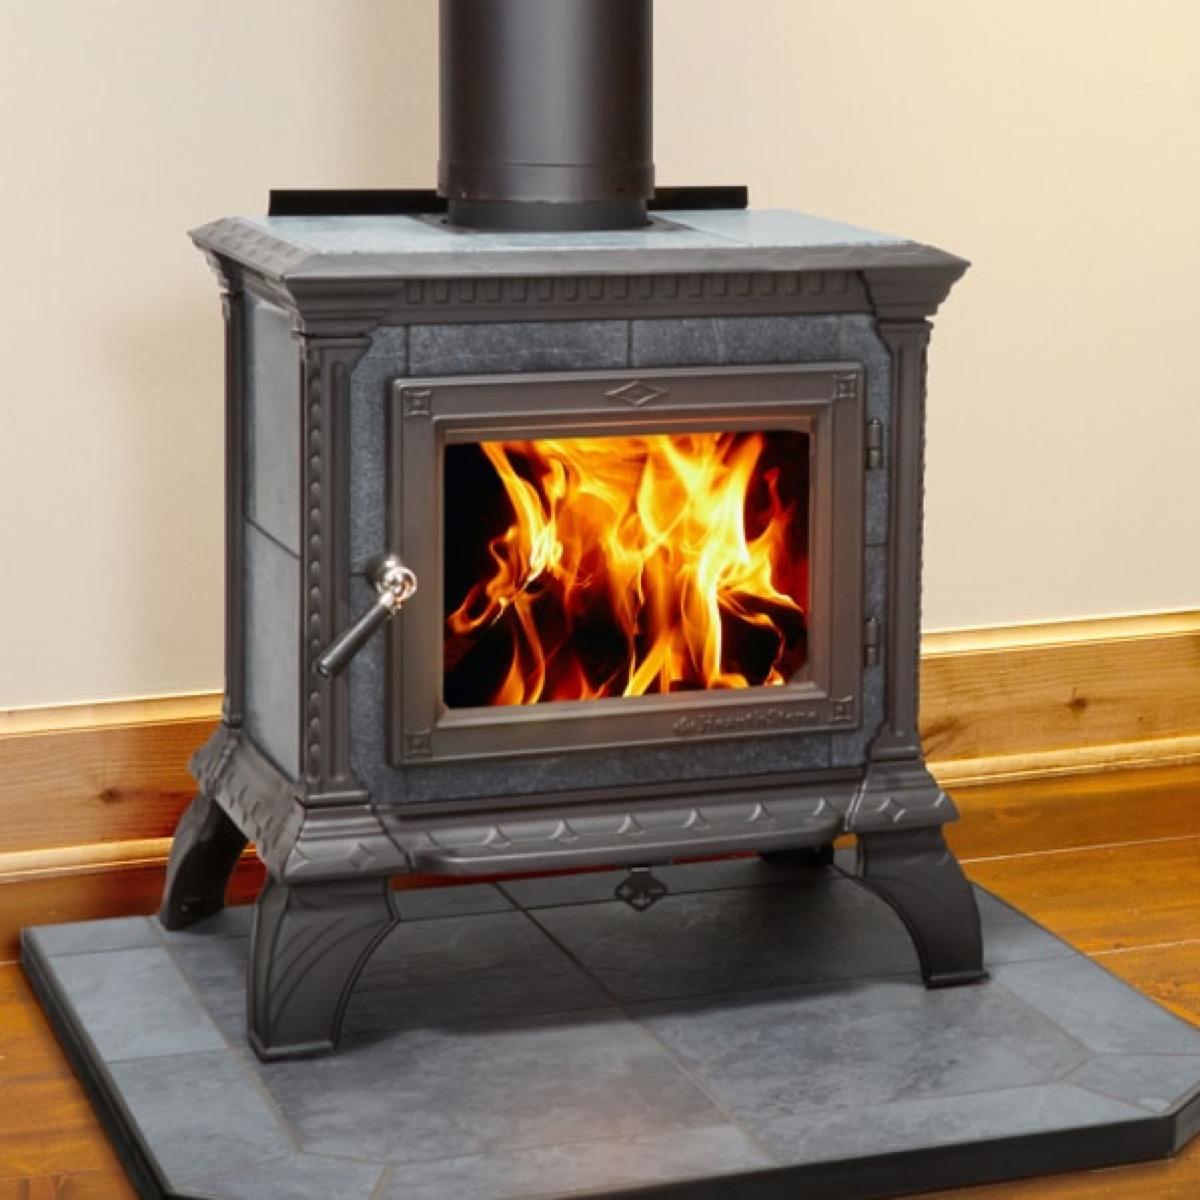 lehman's wood-burning stove vintage home fixtures